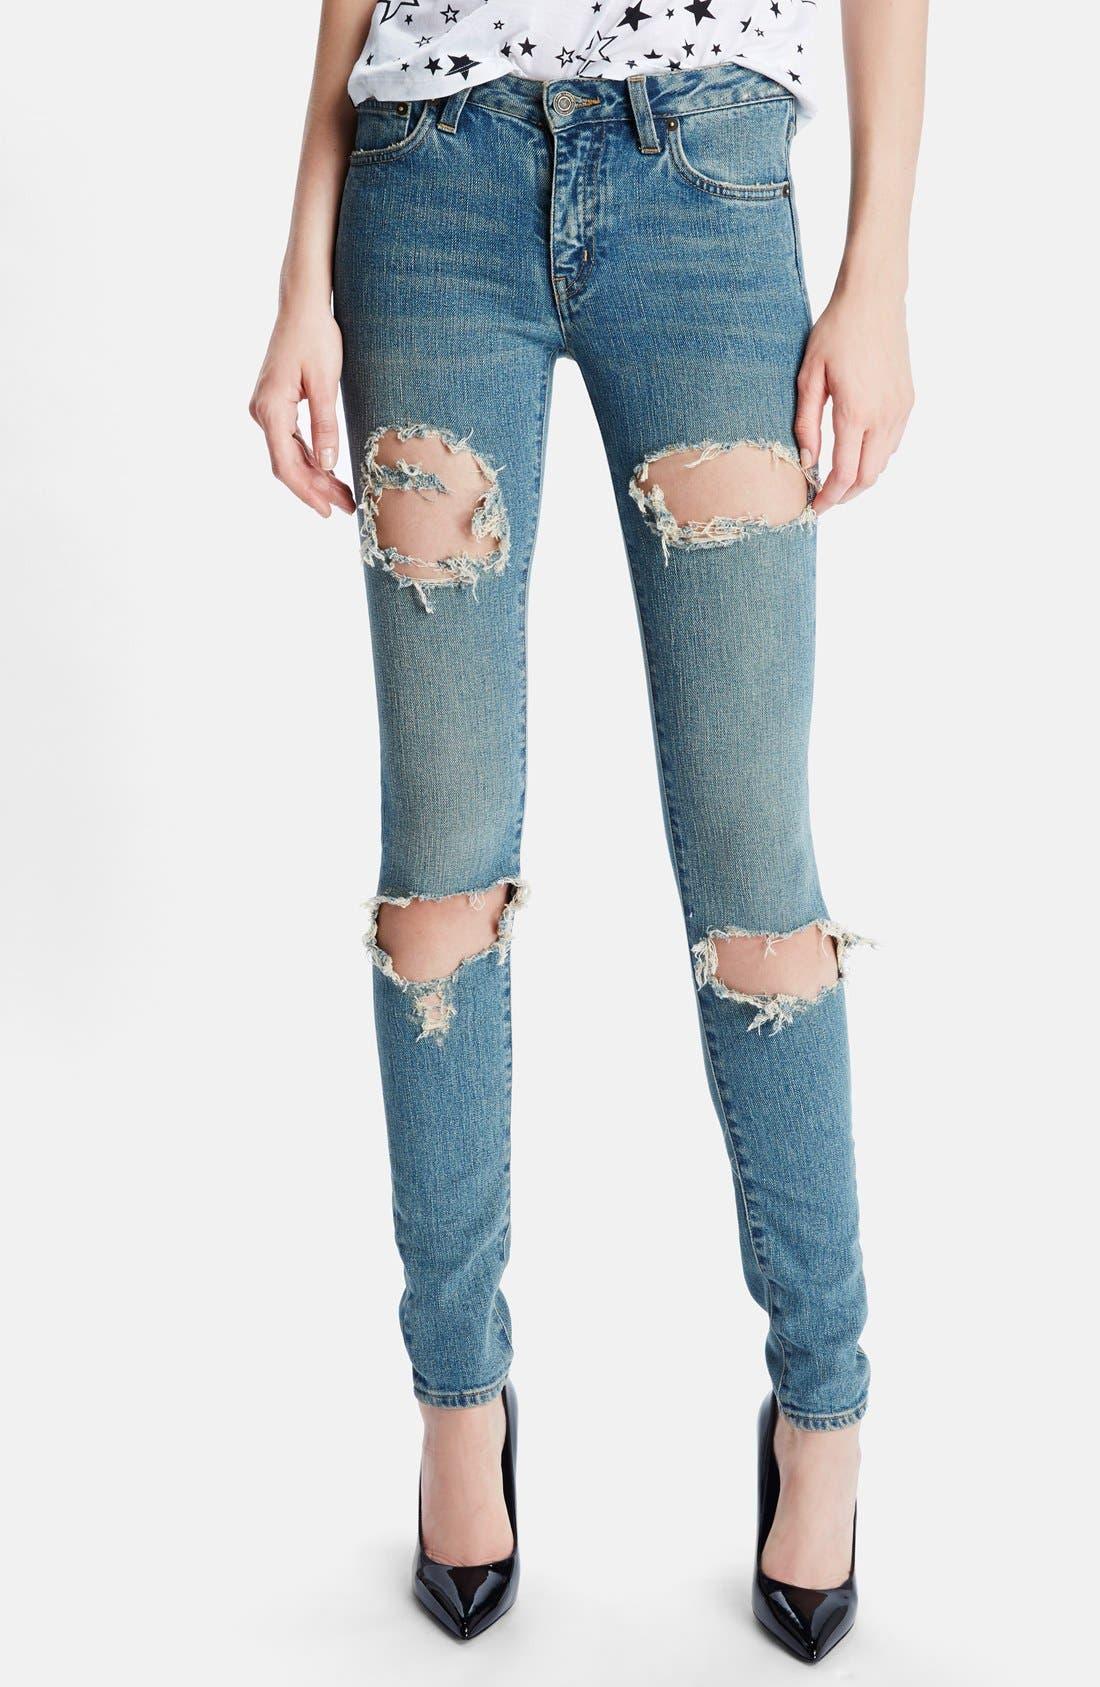 Alternate Image 1 Selected - Saint Laurent 'Dirty 50s' Destroyed Skinny Jeans